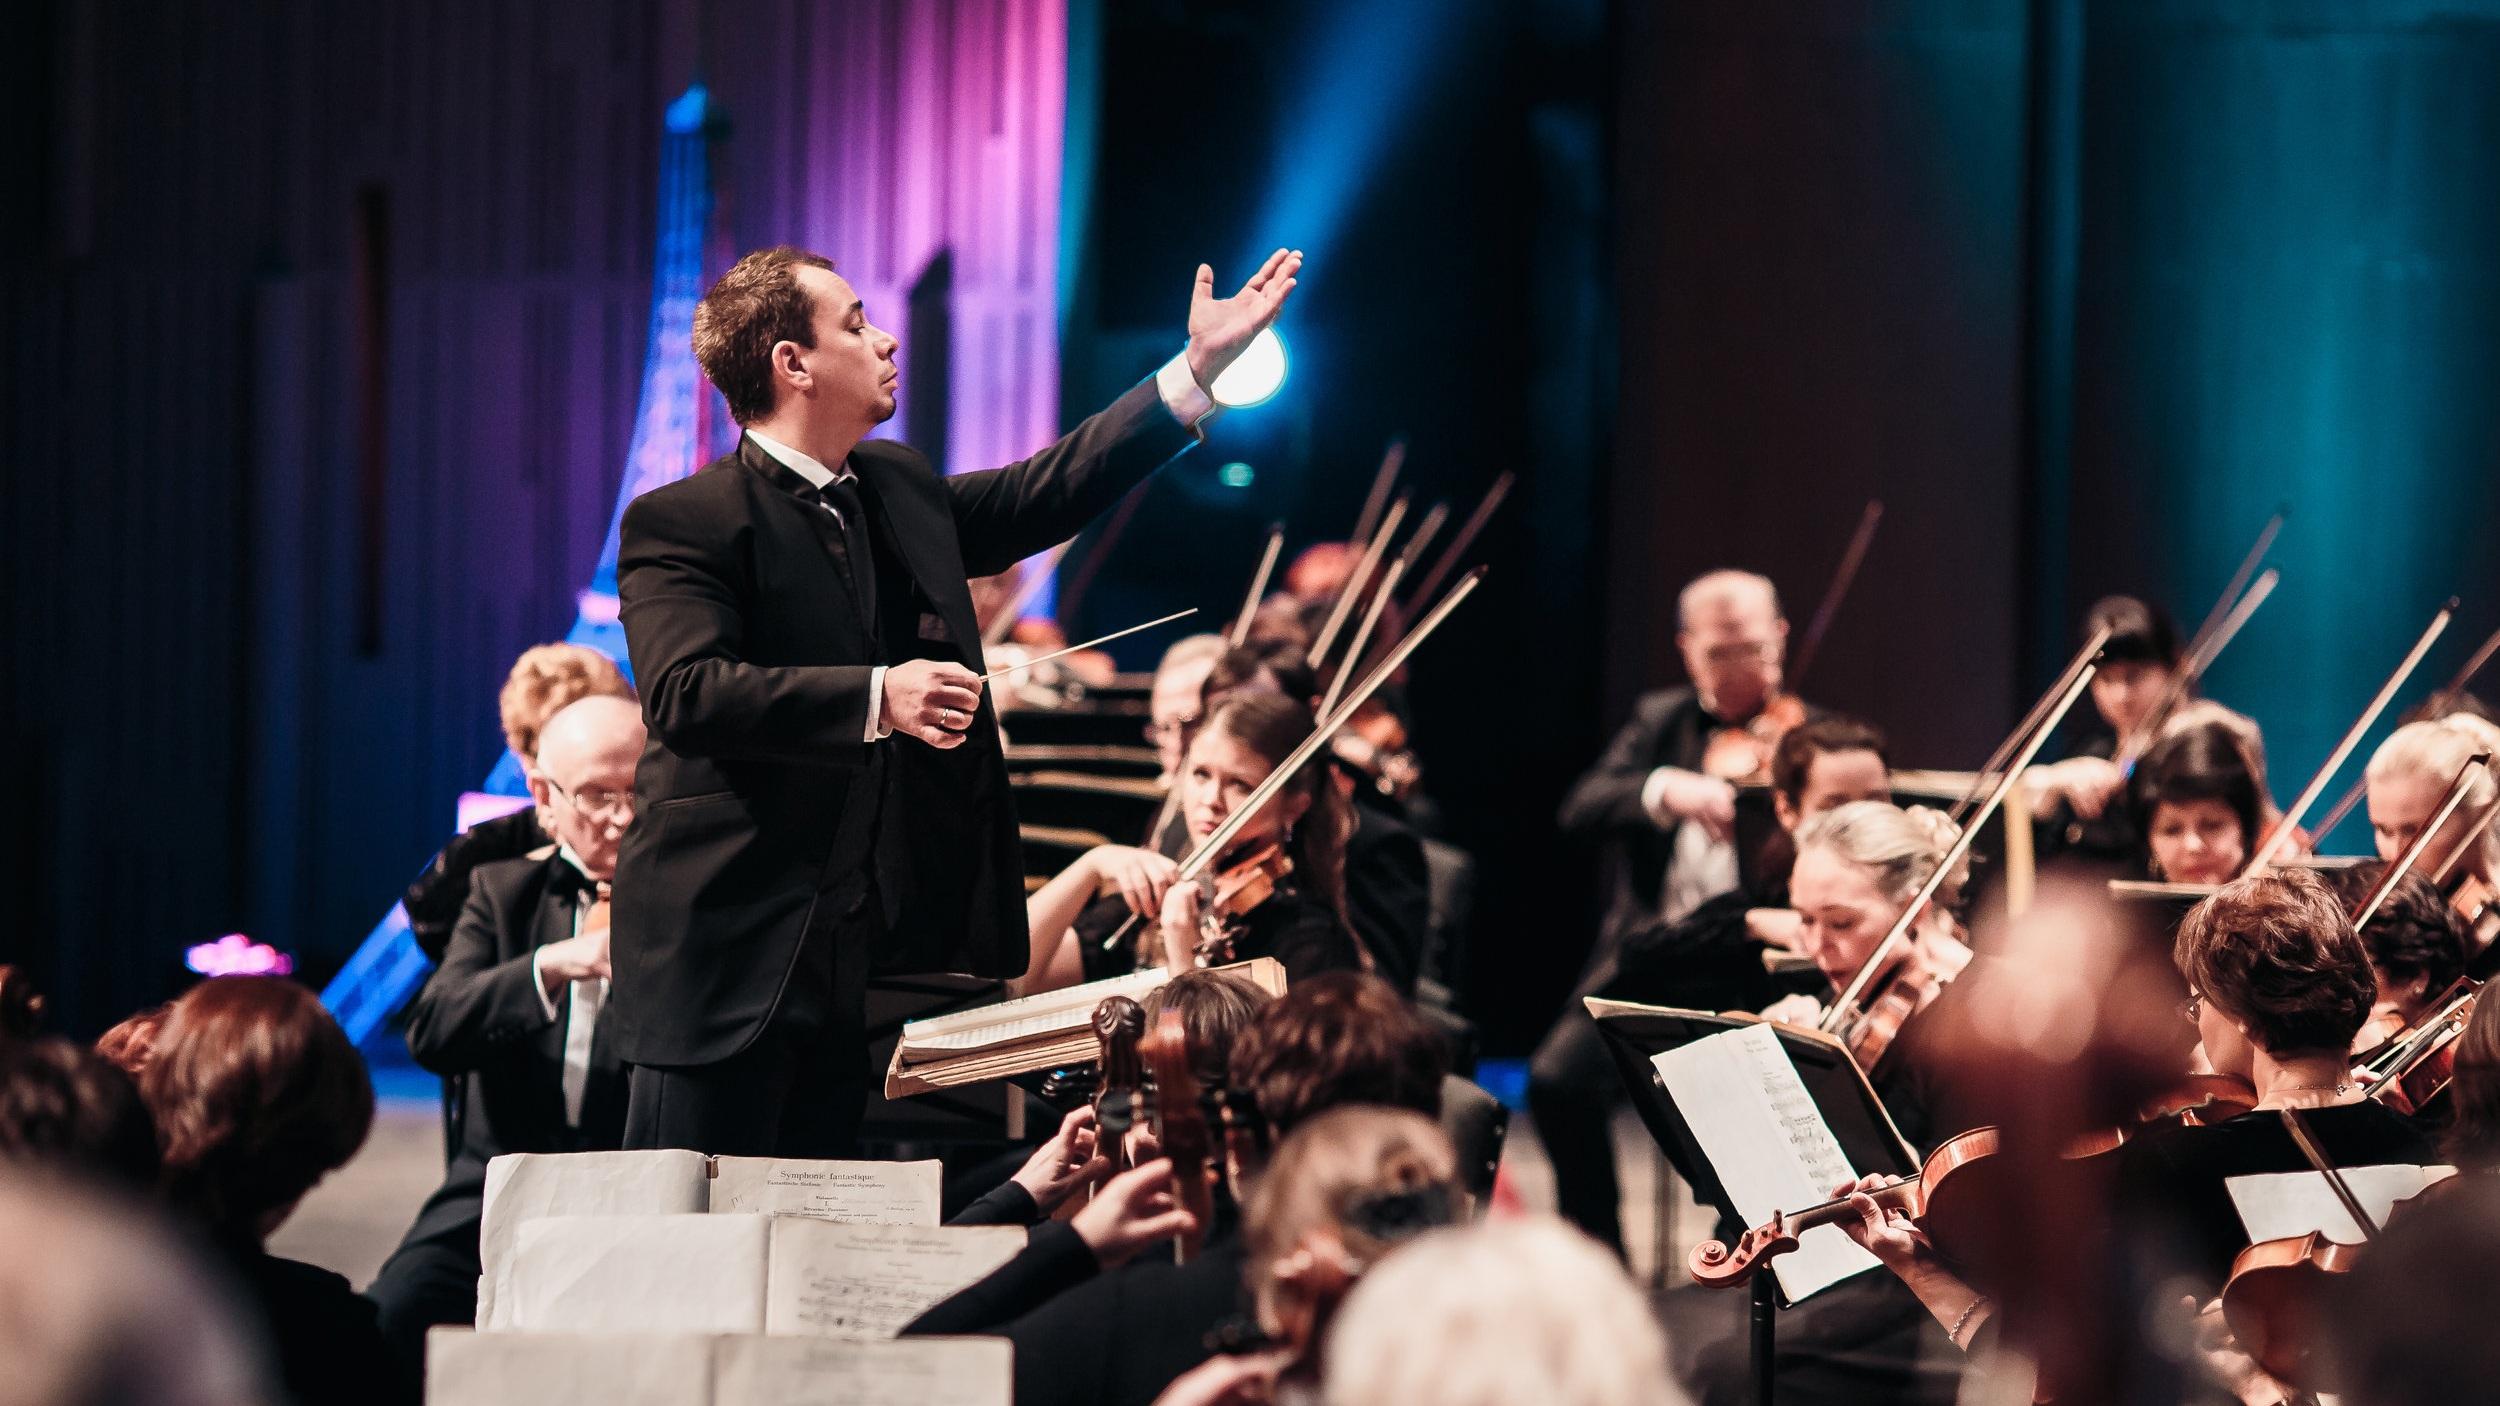 Orchestra2.jpg